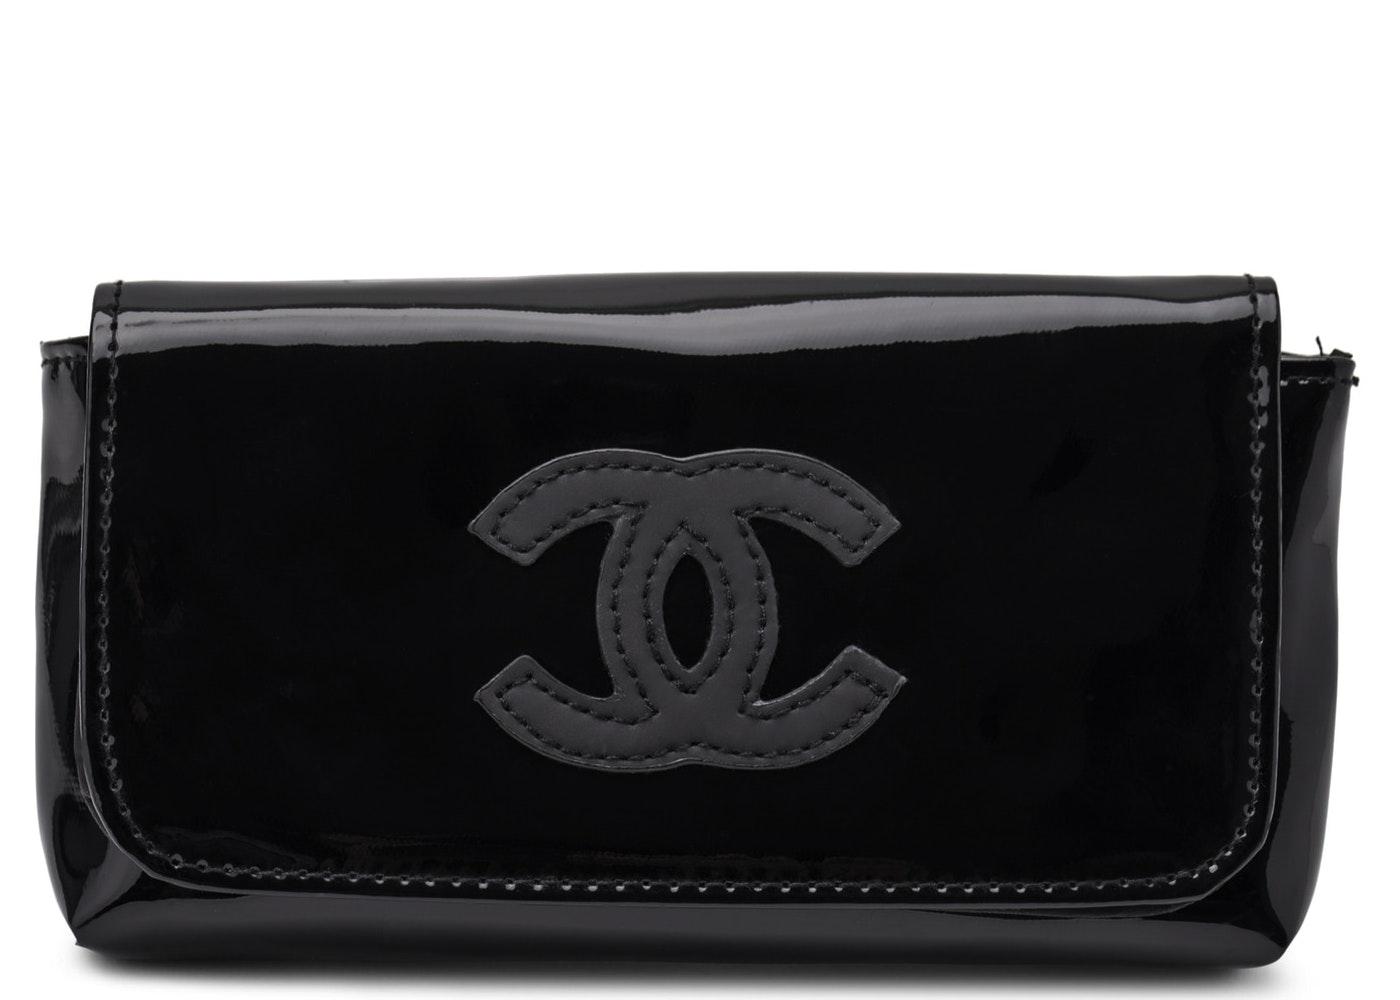 Chanel VIP Belt Bag Black